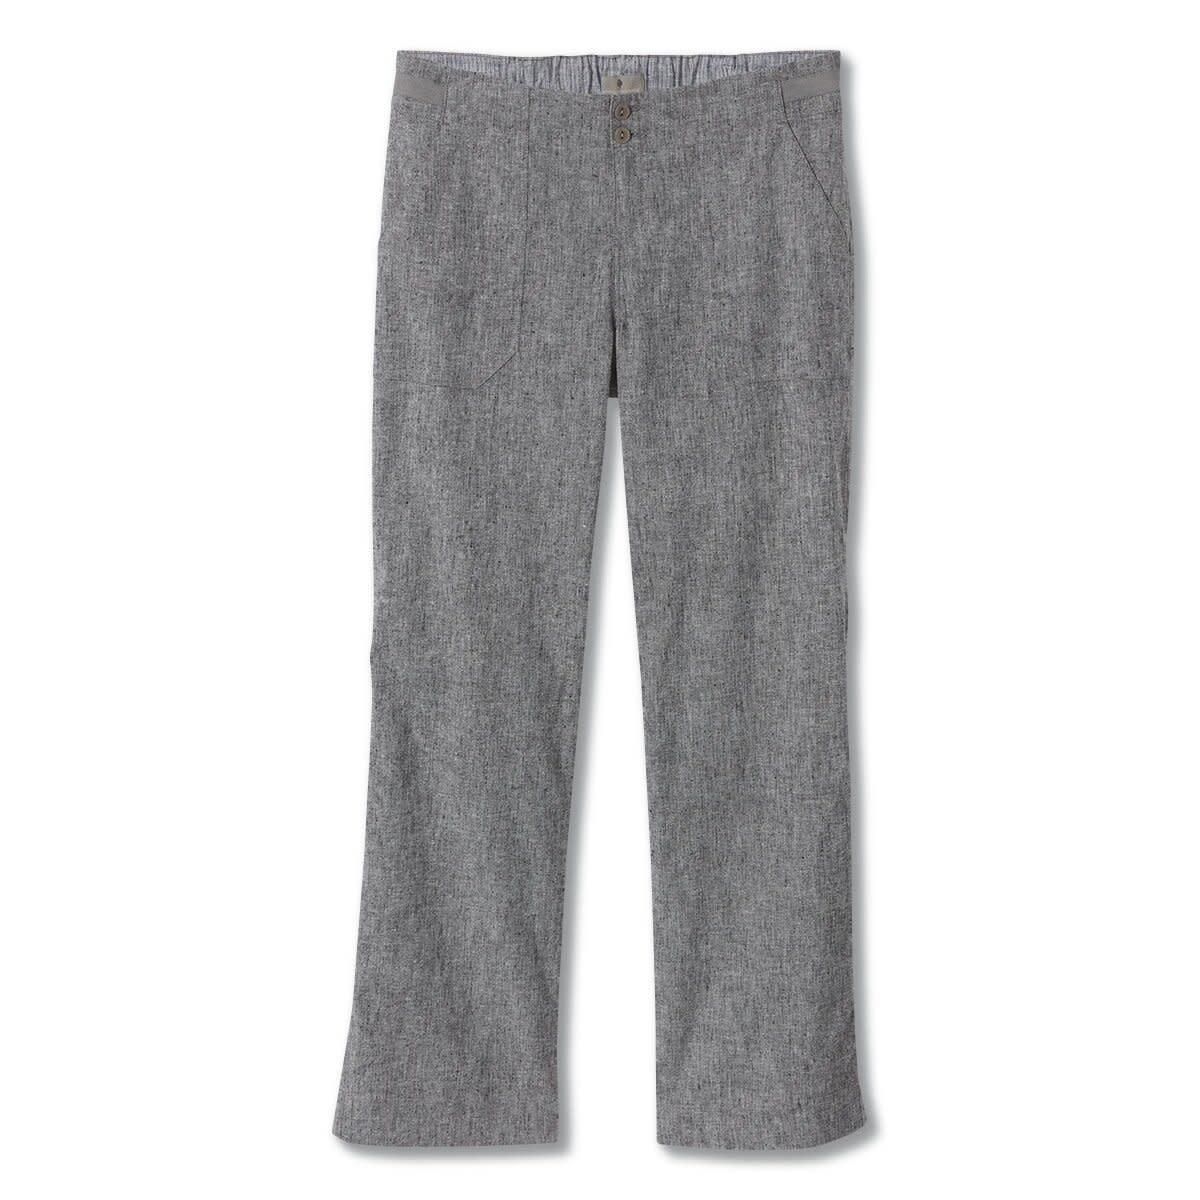 Royal Robbins Hempline Pant - Asphalt